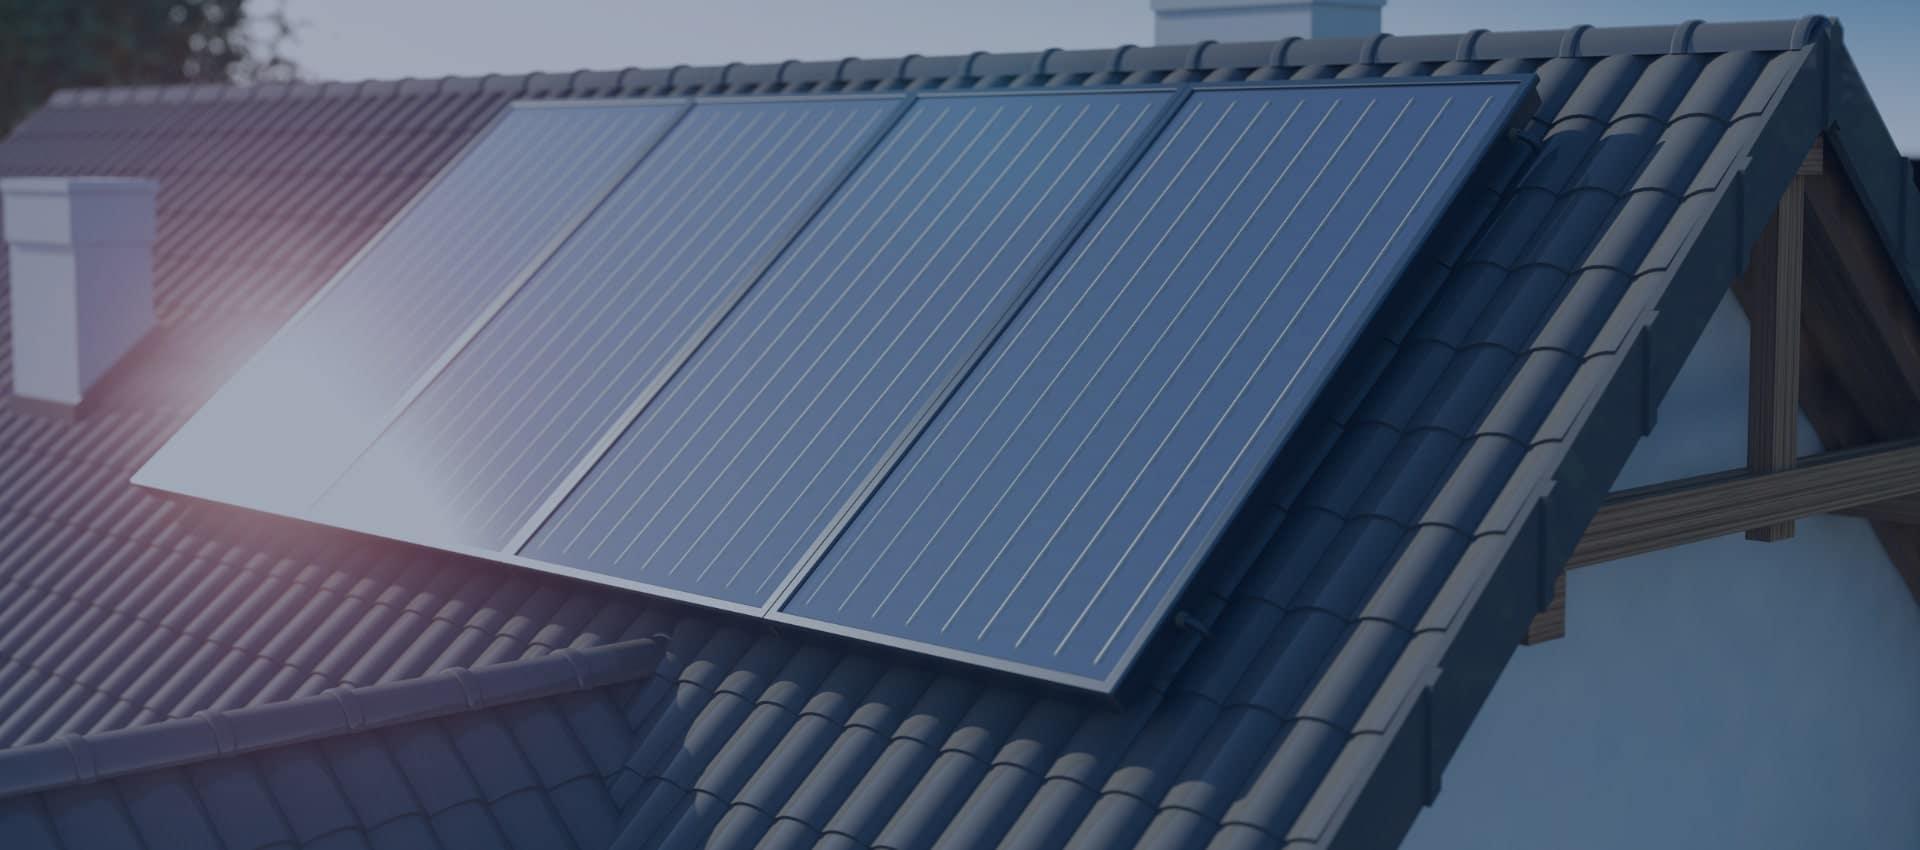 Closeup of Residential Solar Panels